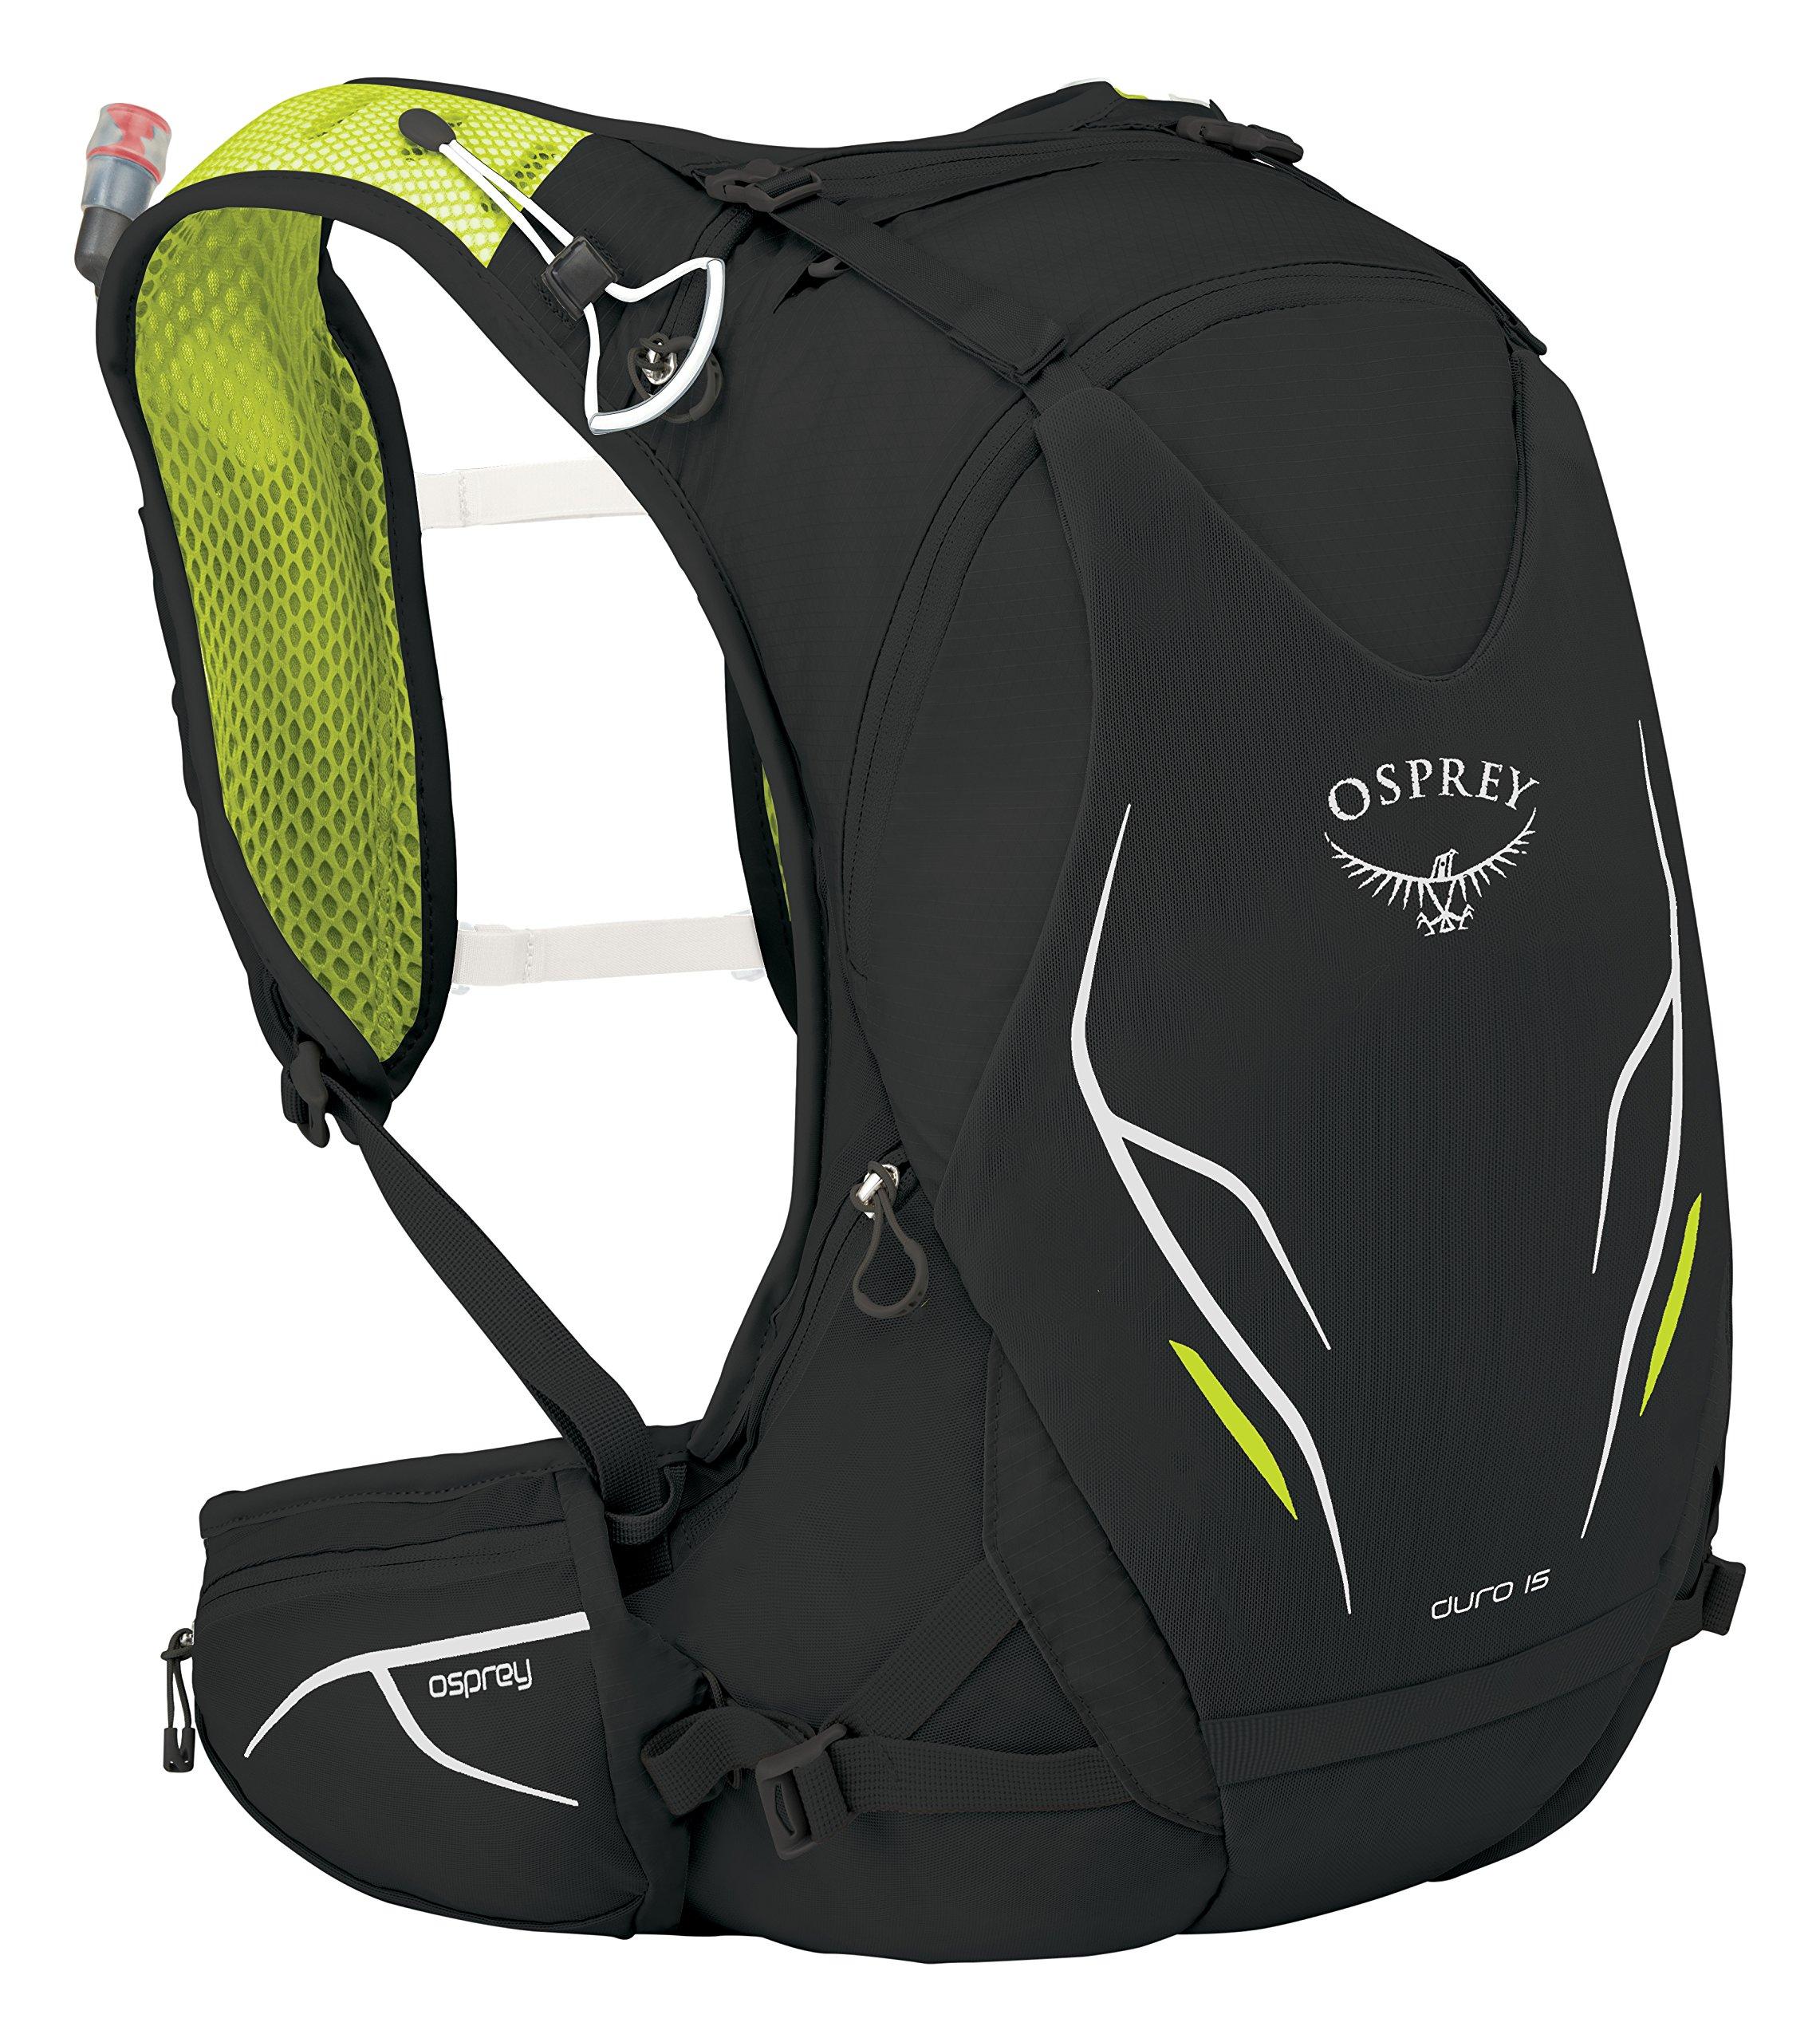 Osprey Packs Duro 15 Hydration Pack, Electric Black, S/M, Small/Medium